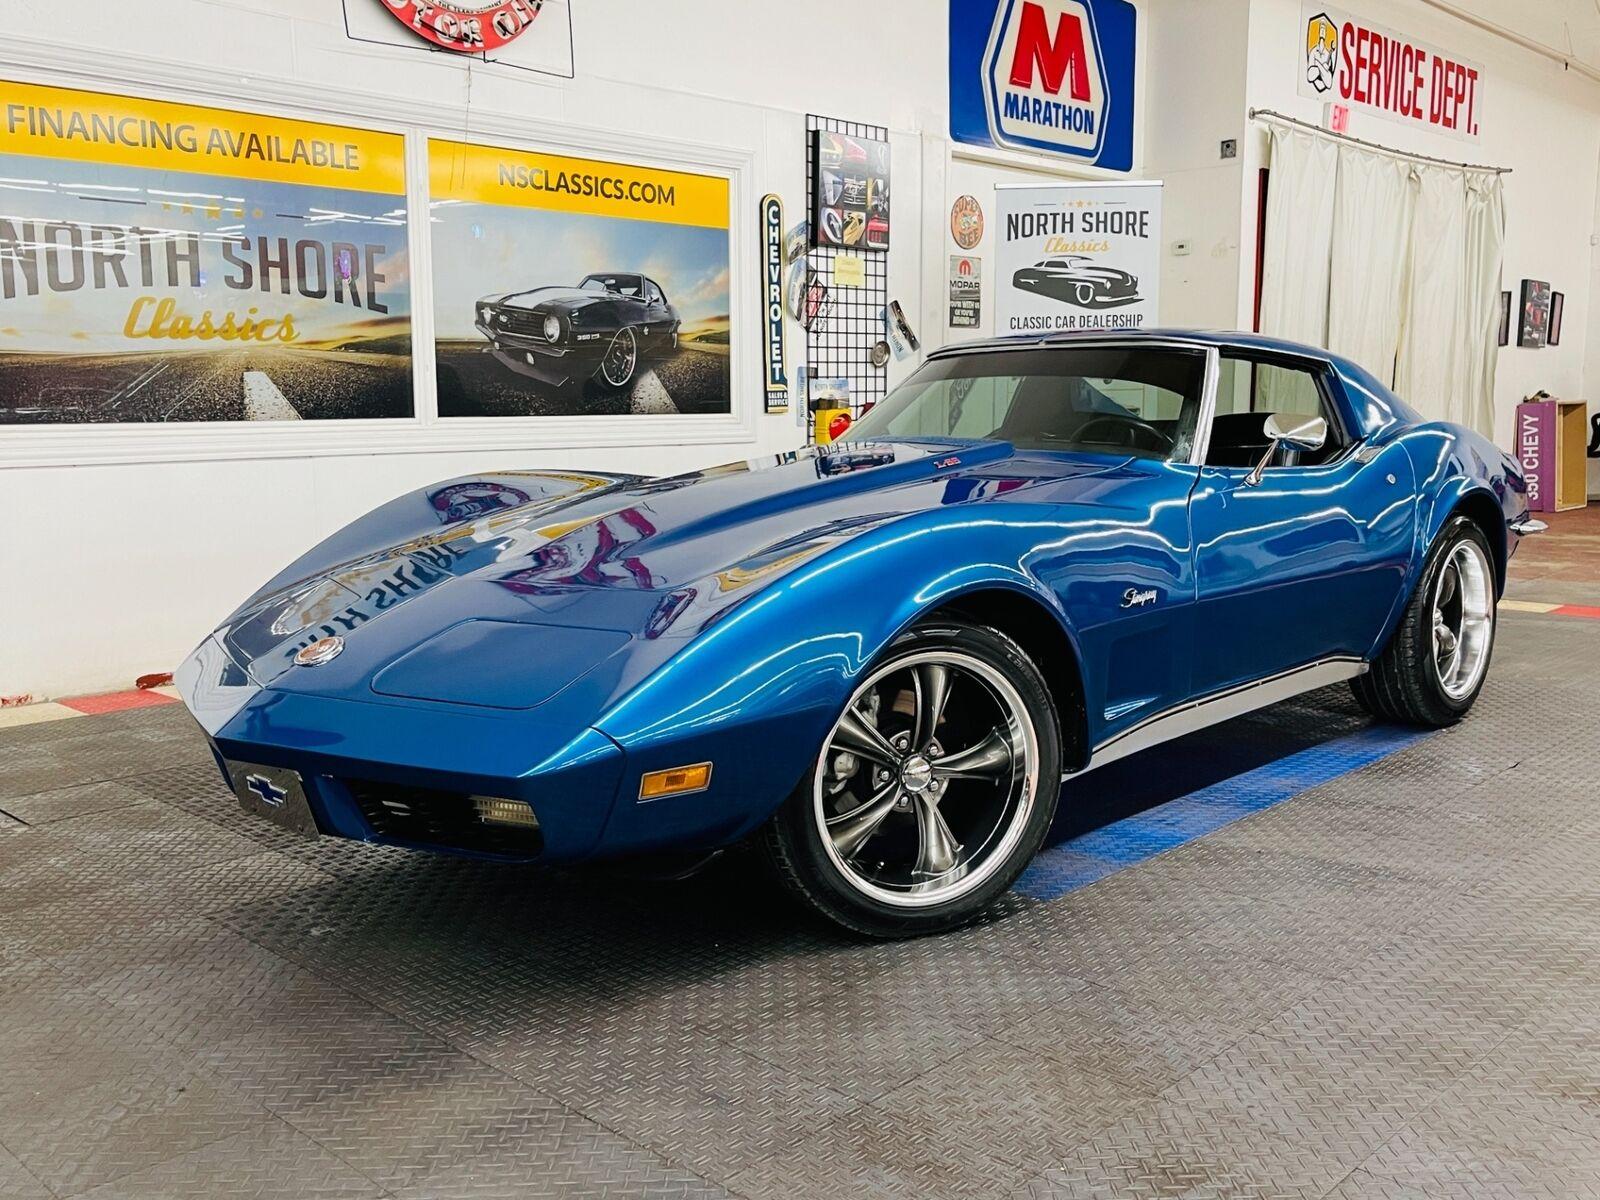 1973 Blue Chevrolet Corvette Coupe  | C3 Corvette Photo 2